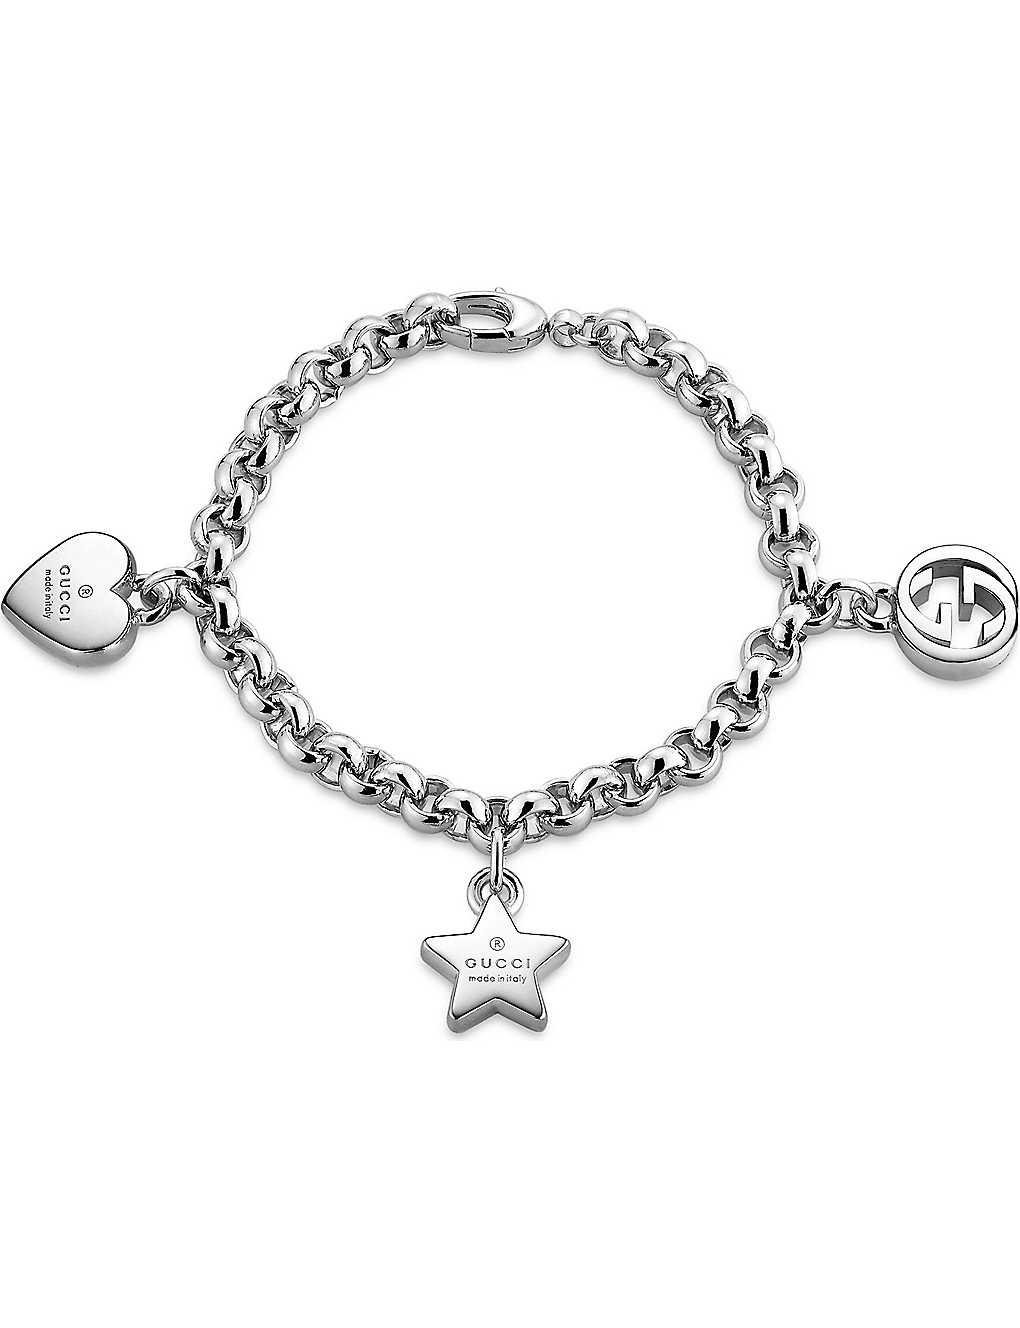 14cbbcab2 Us Usd English. Gucci Trademark Sterling Silver Charm Bracelet Selfridges  -> Source. Silver Trademark Charm Bracelet